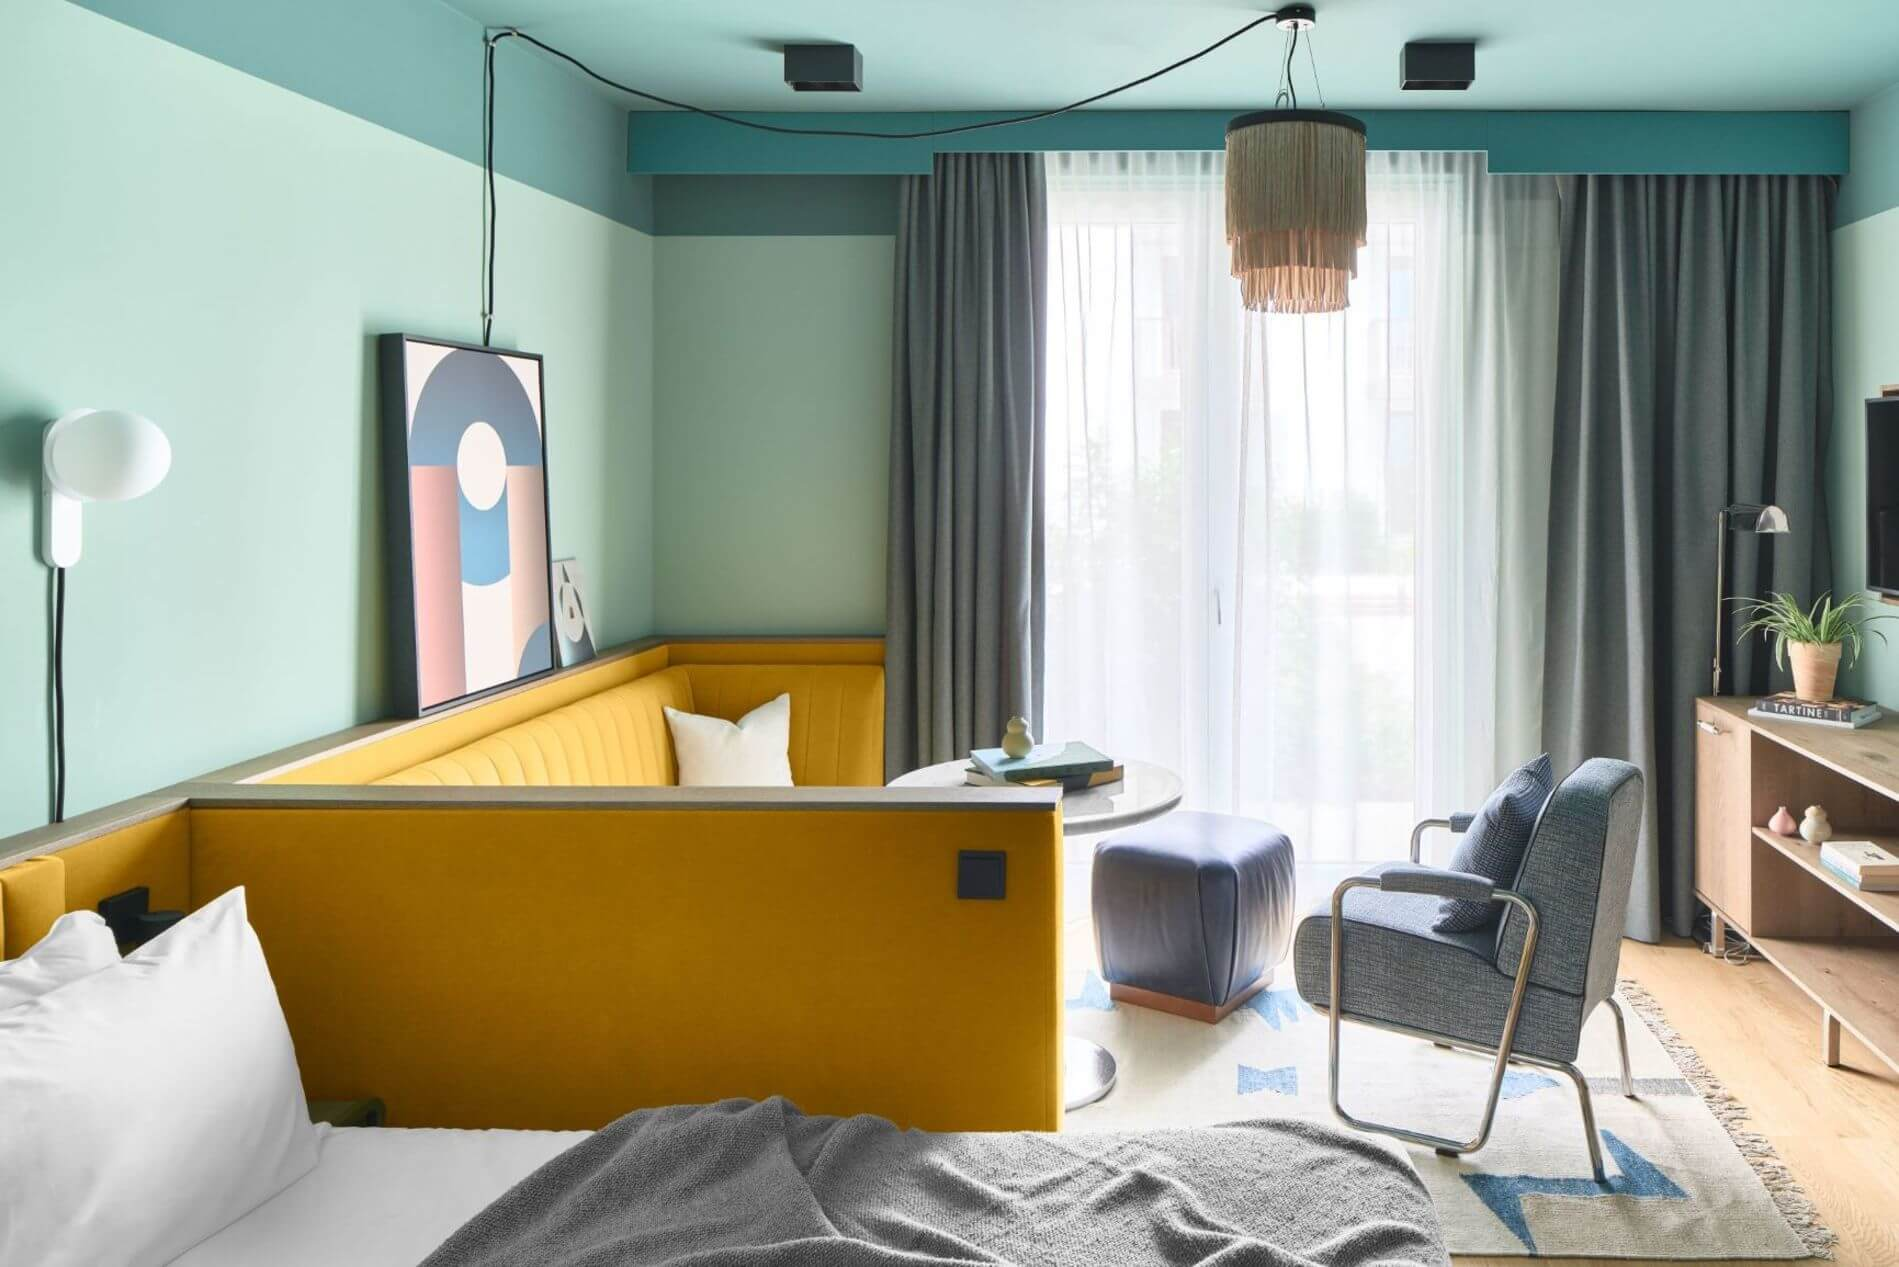 Studio apartment in Munich 3